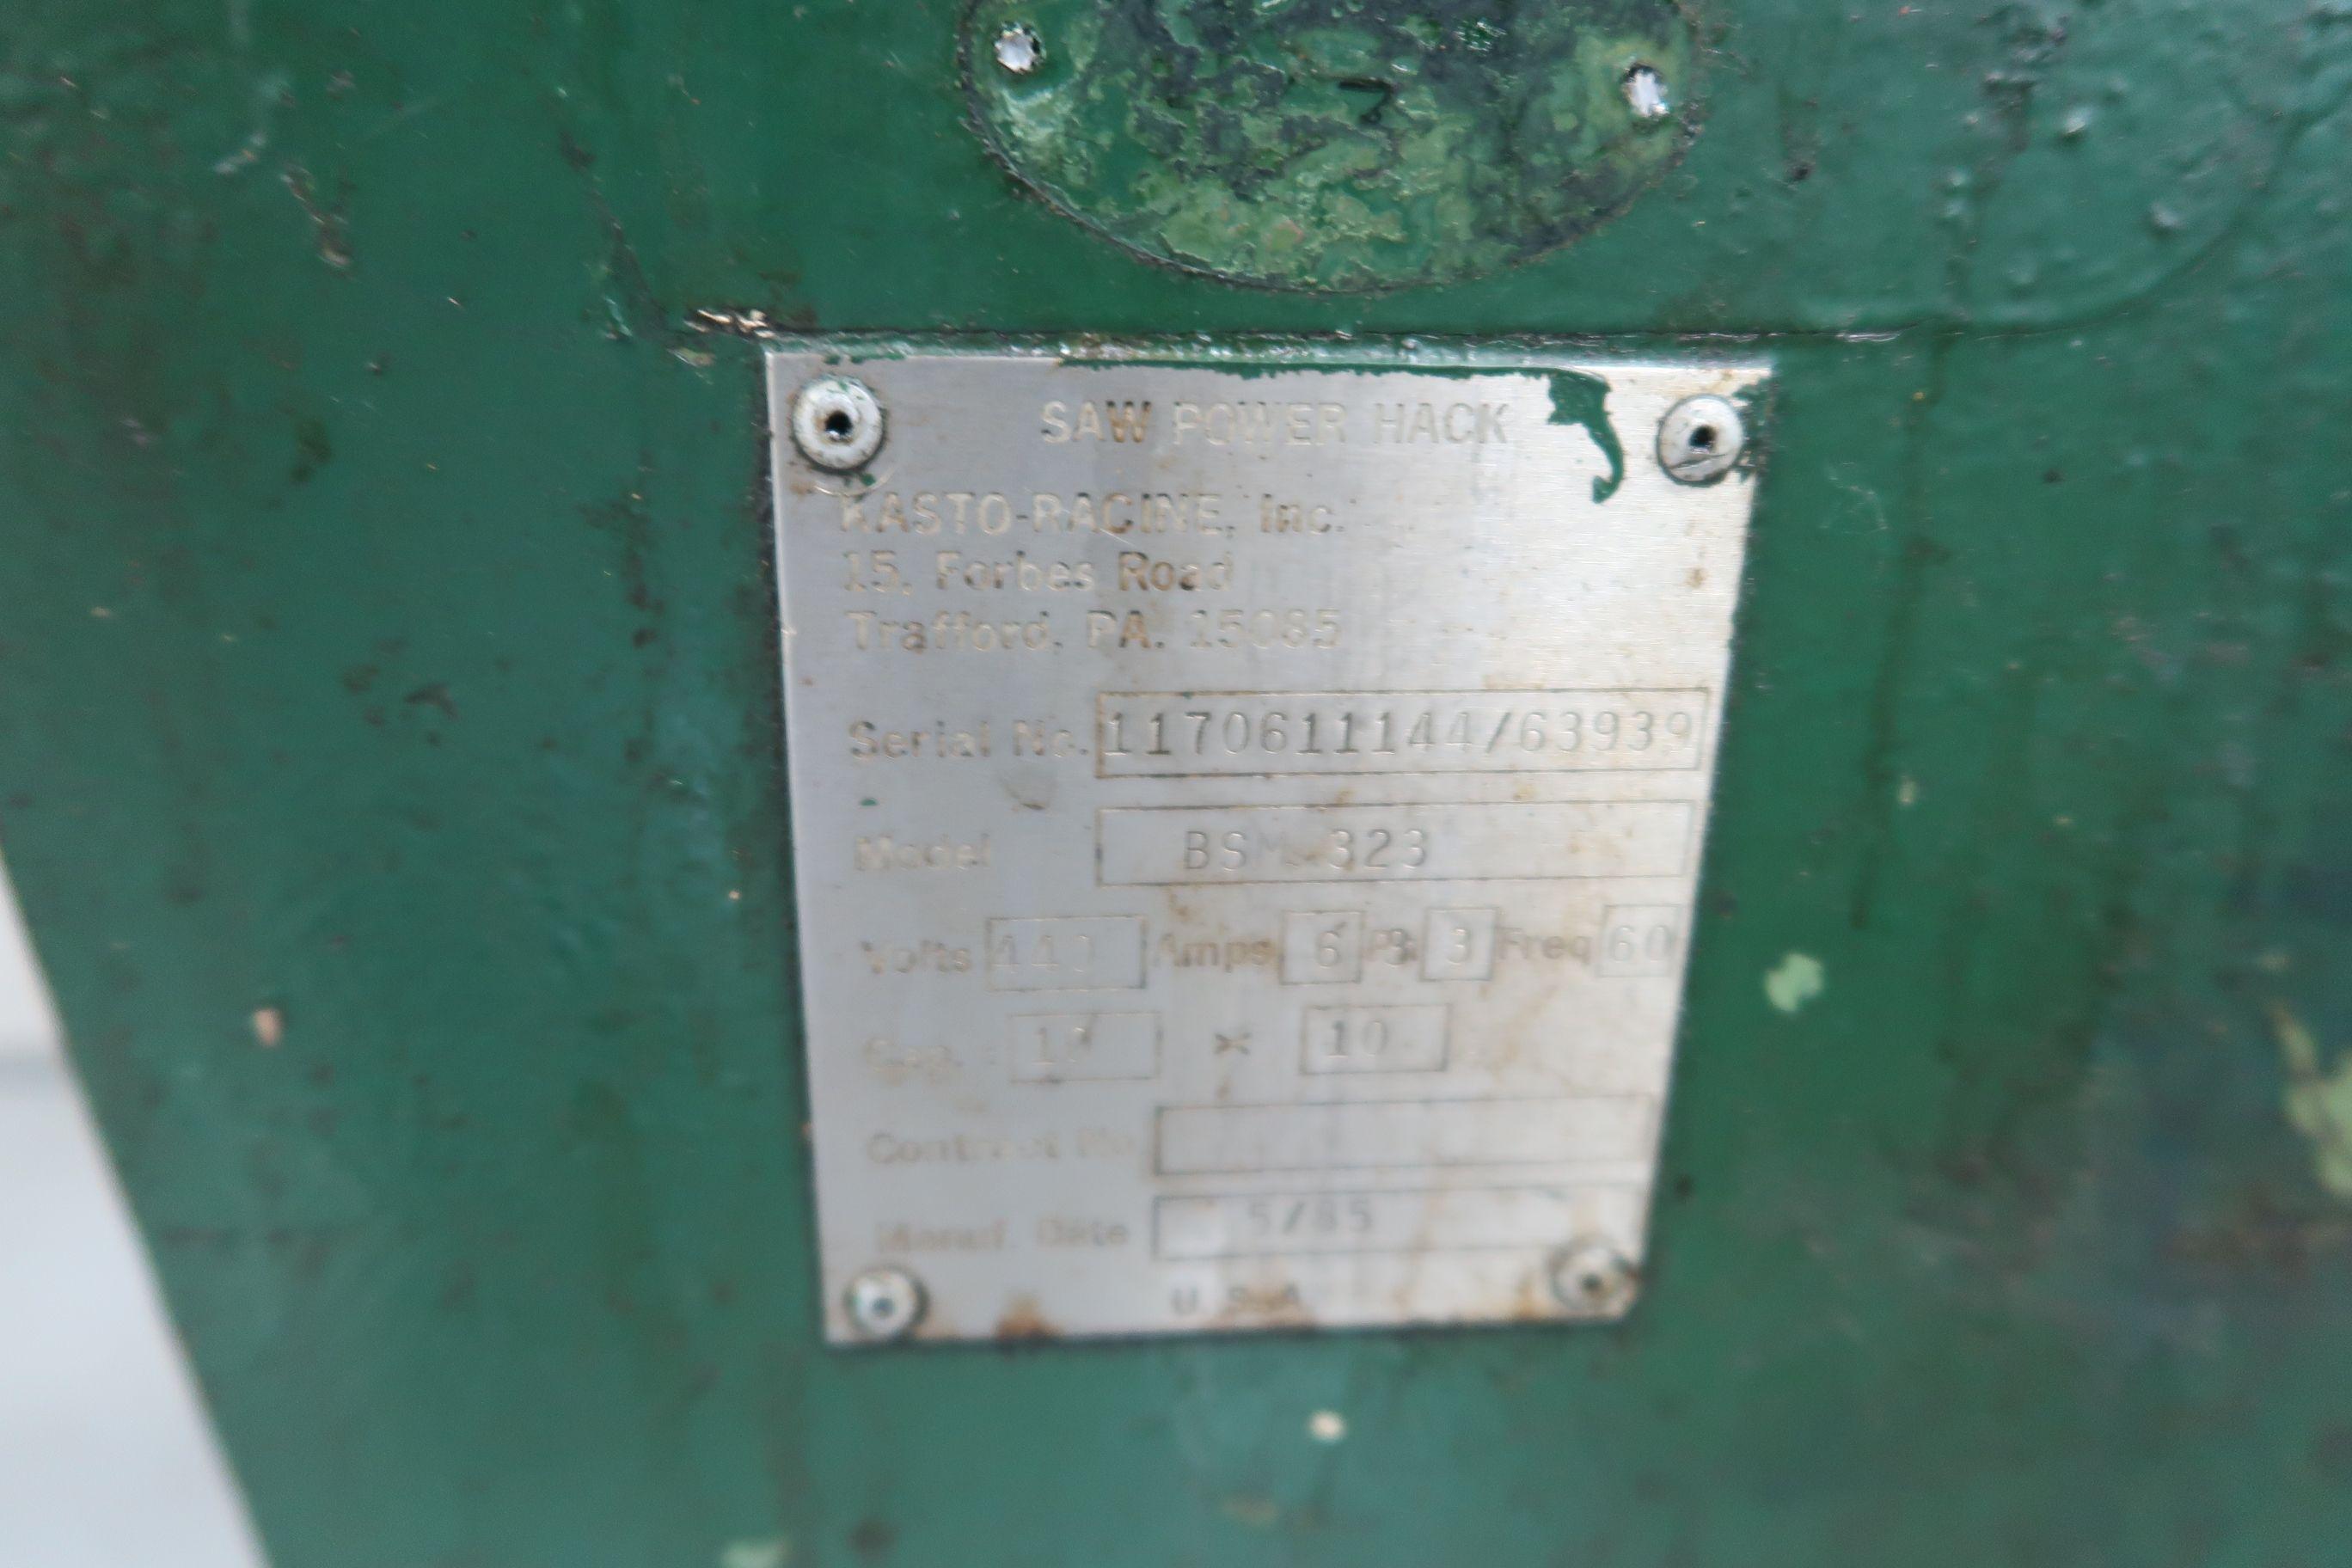 "18"" KASTO-RACINE MODEL BSM-323 RECIPRICATING HACK SAW; S/N 1170611144/63939, WITH (4) SAW BLADES - Image 4 of 7"